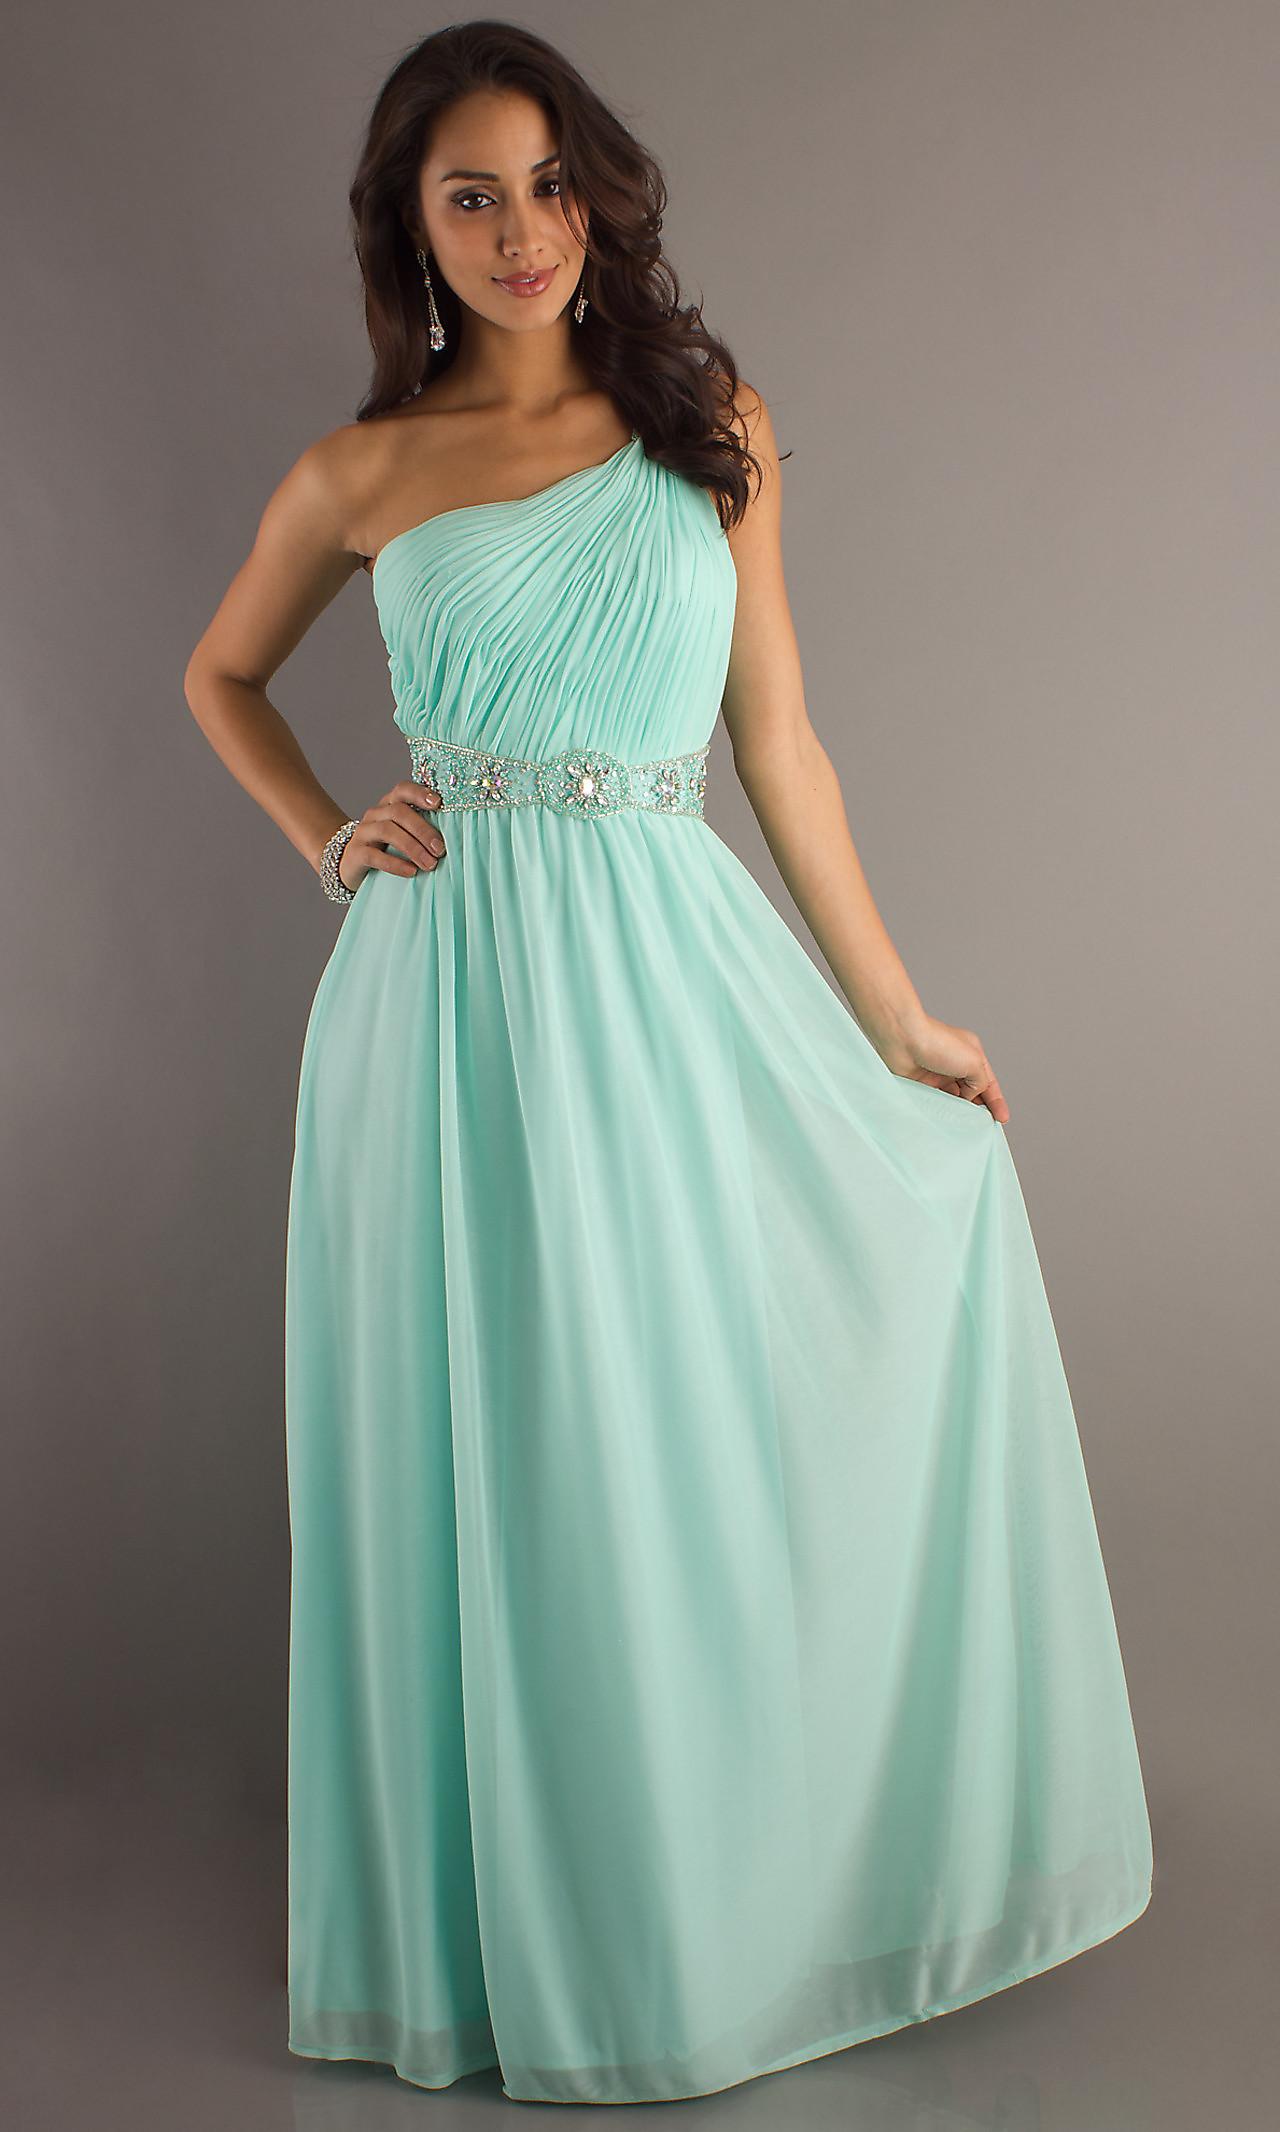 Long Prom Dresses Under 100 Uk